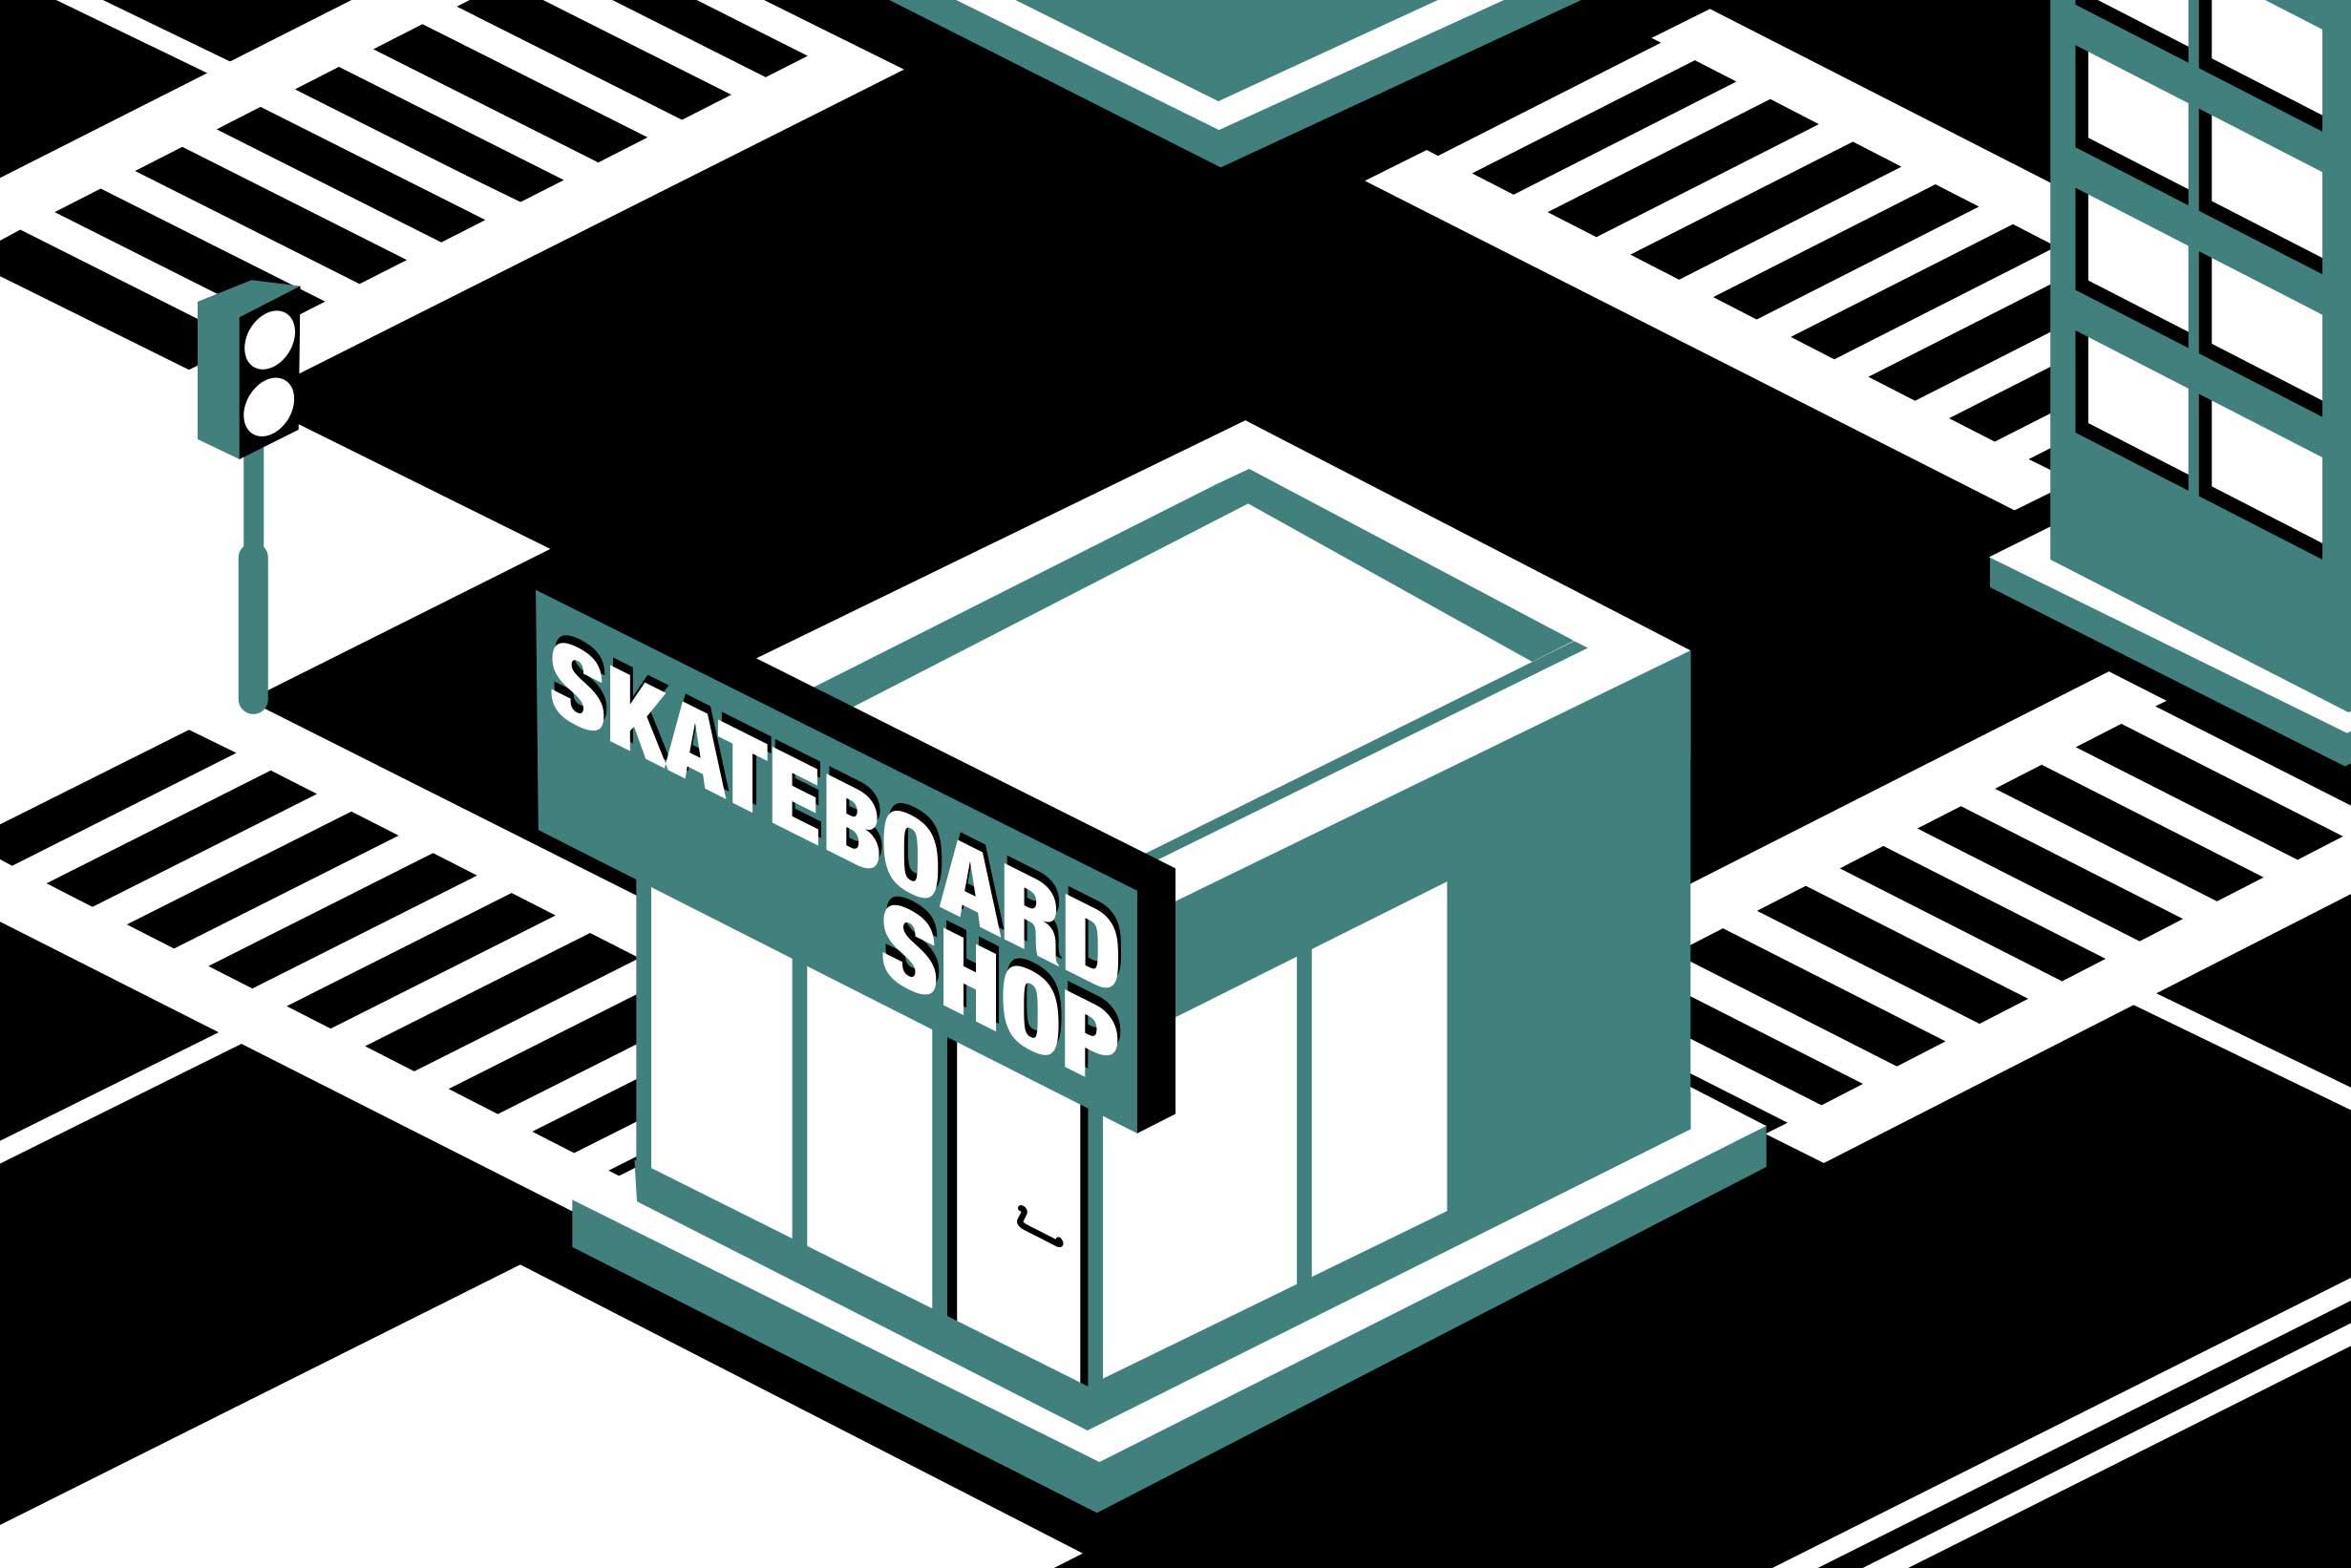 4_decks_design_graphic_lanikai_skate